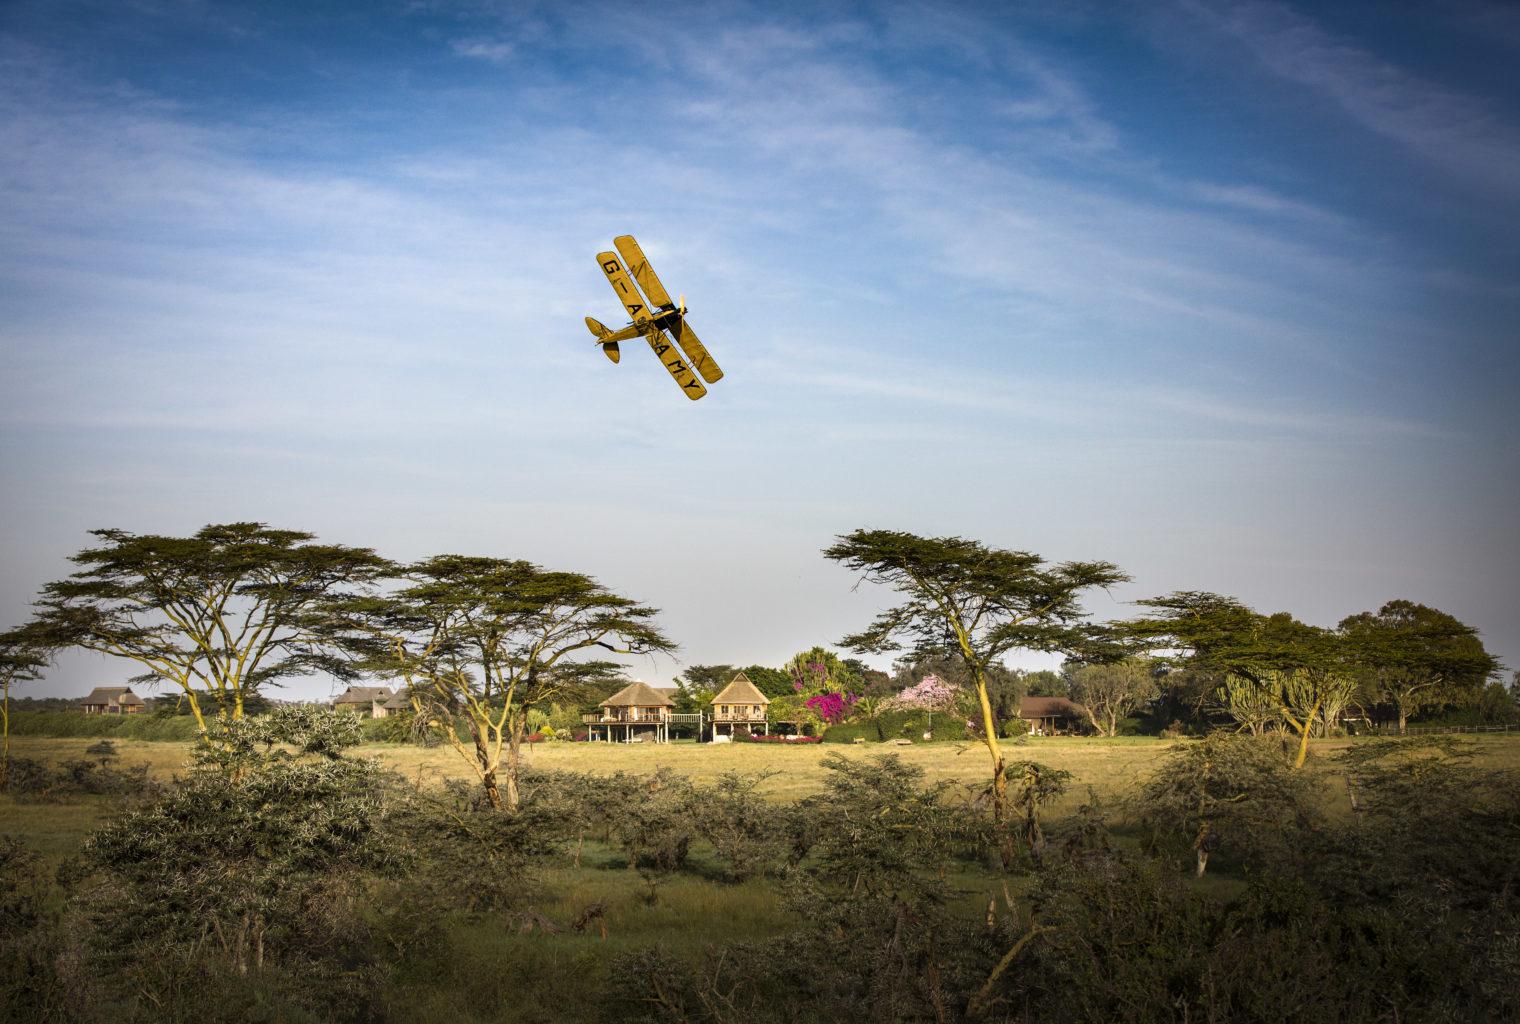 Segera Retreat Kenya Activity